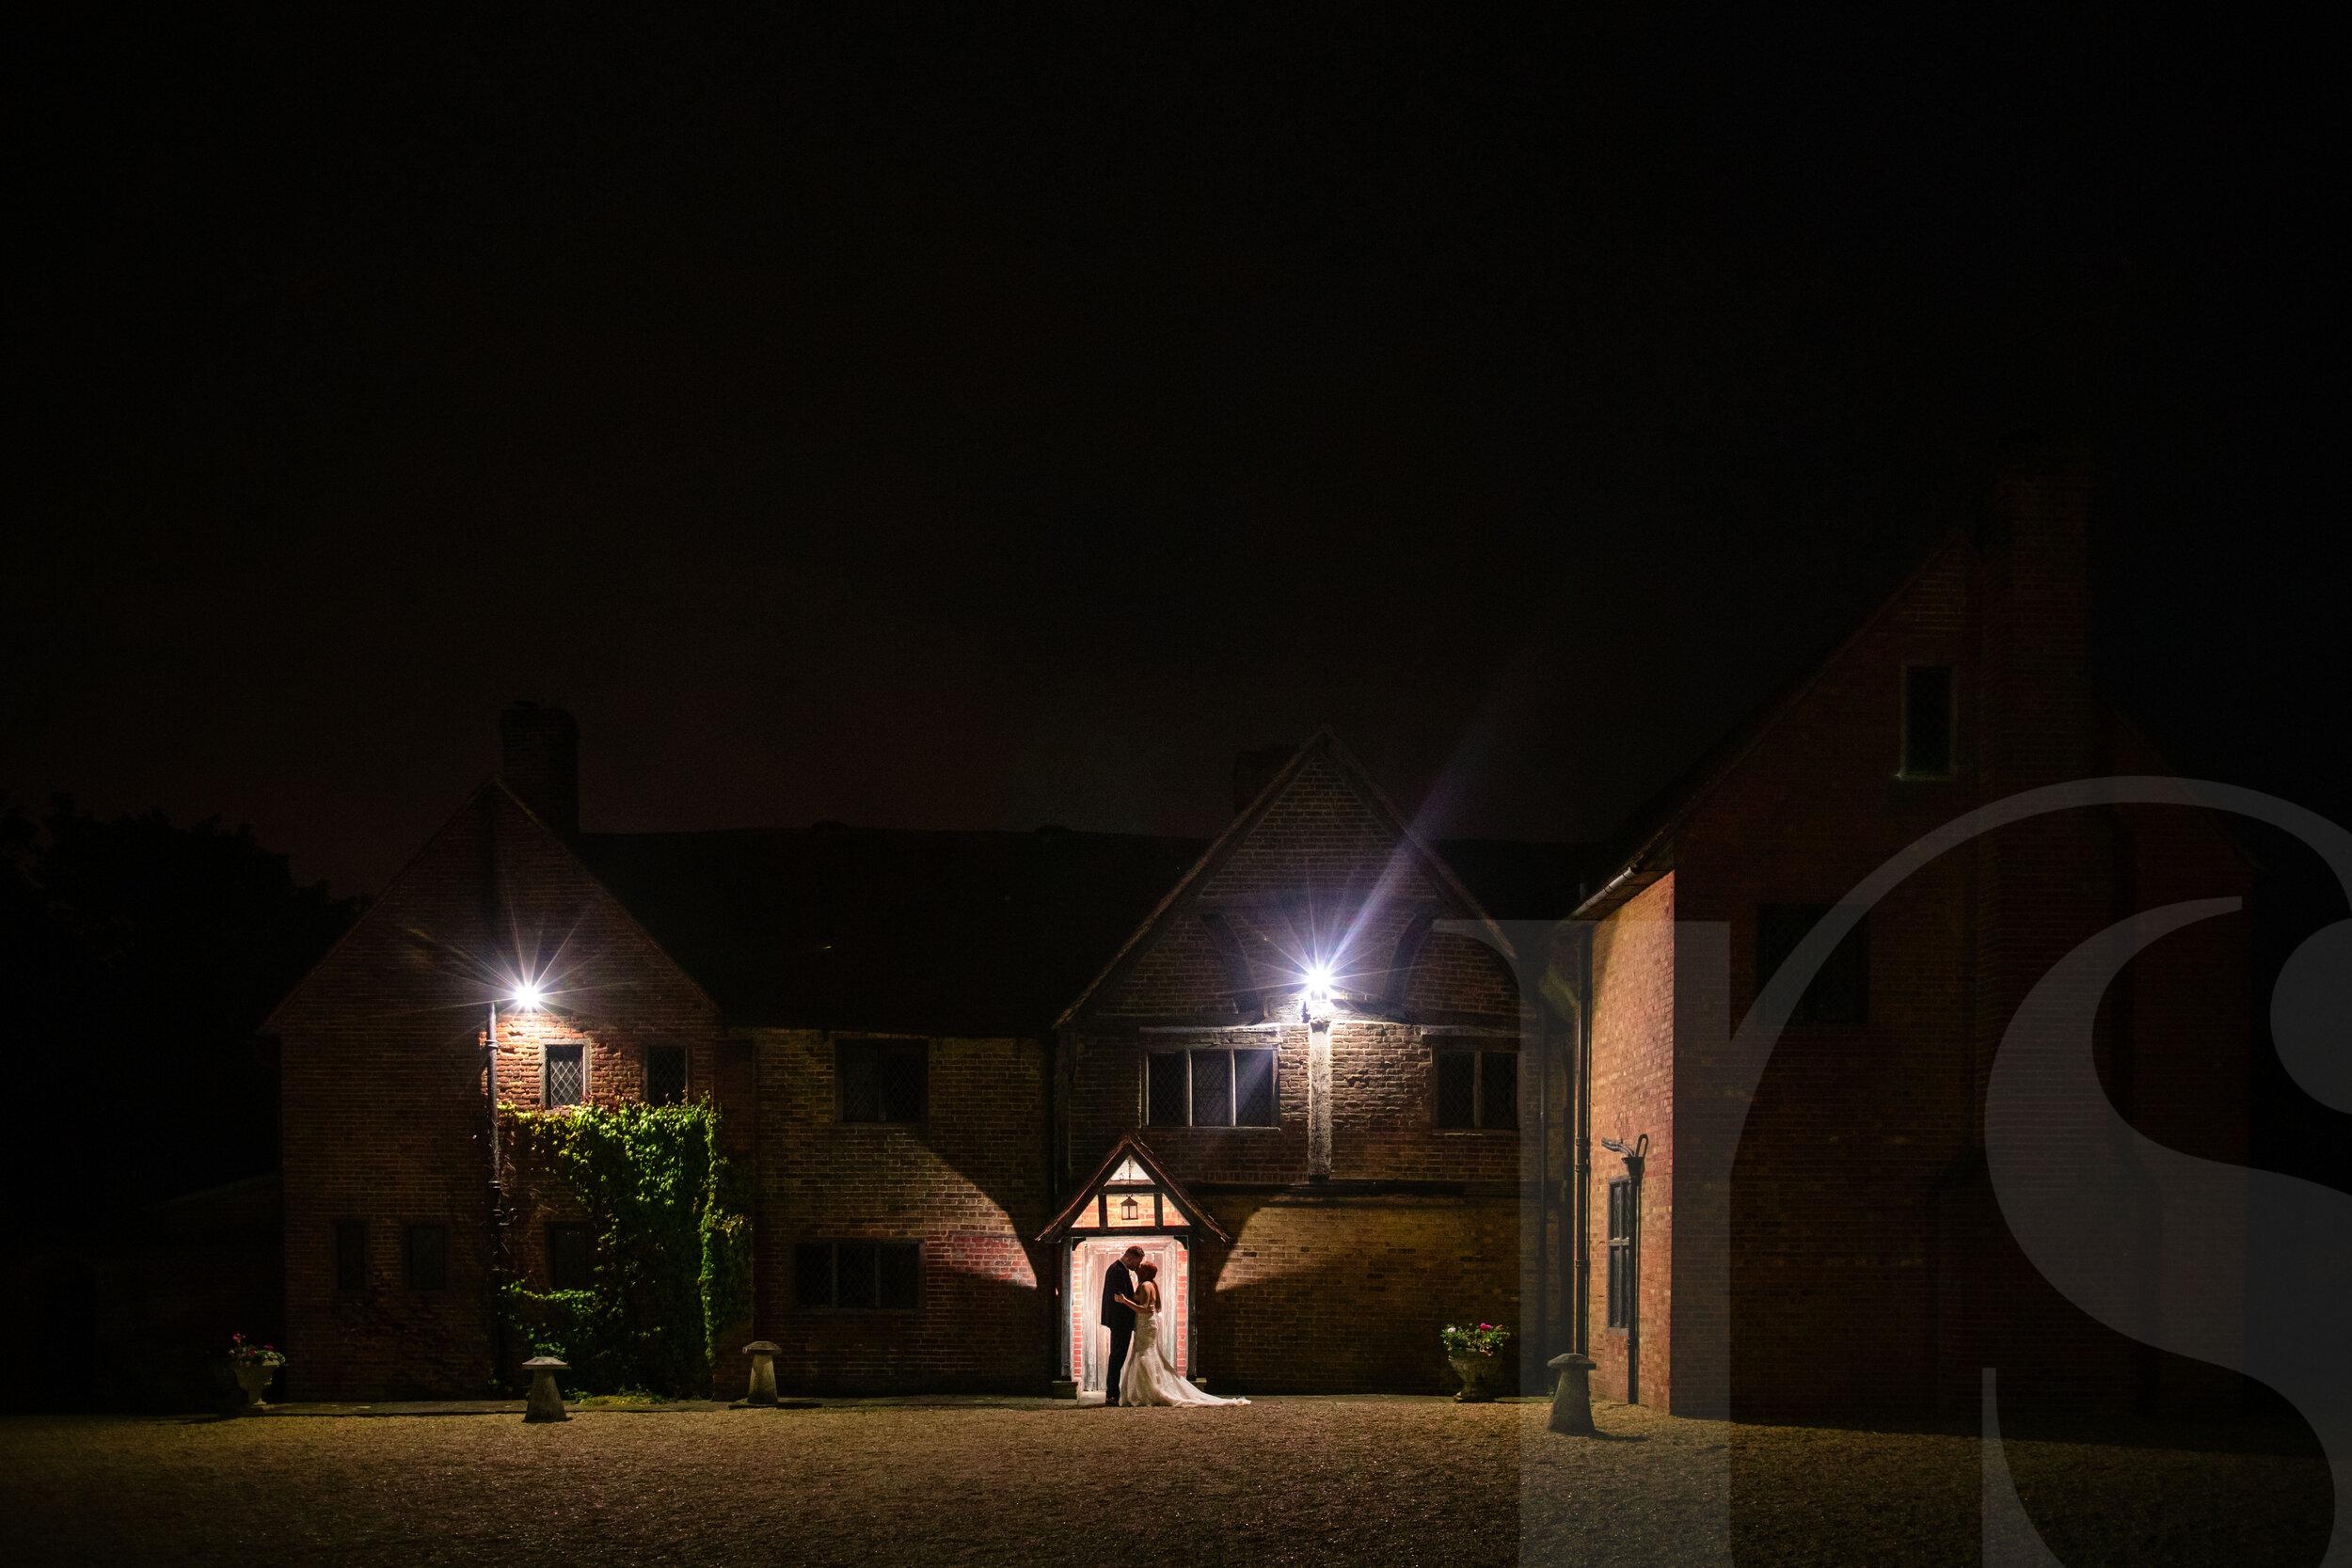 lillibrooke-manor-wedding-photographer-1.jpg